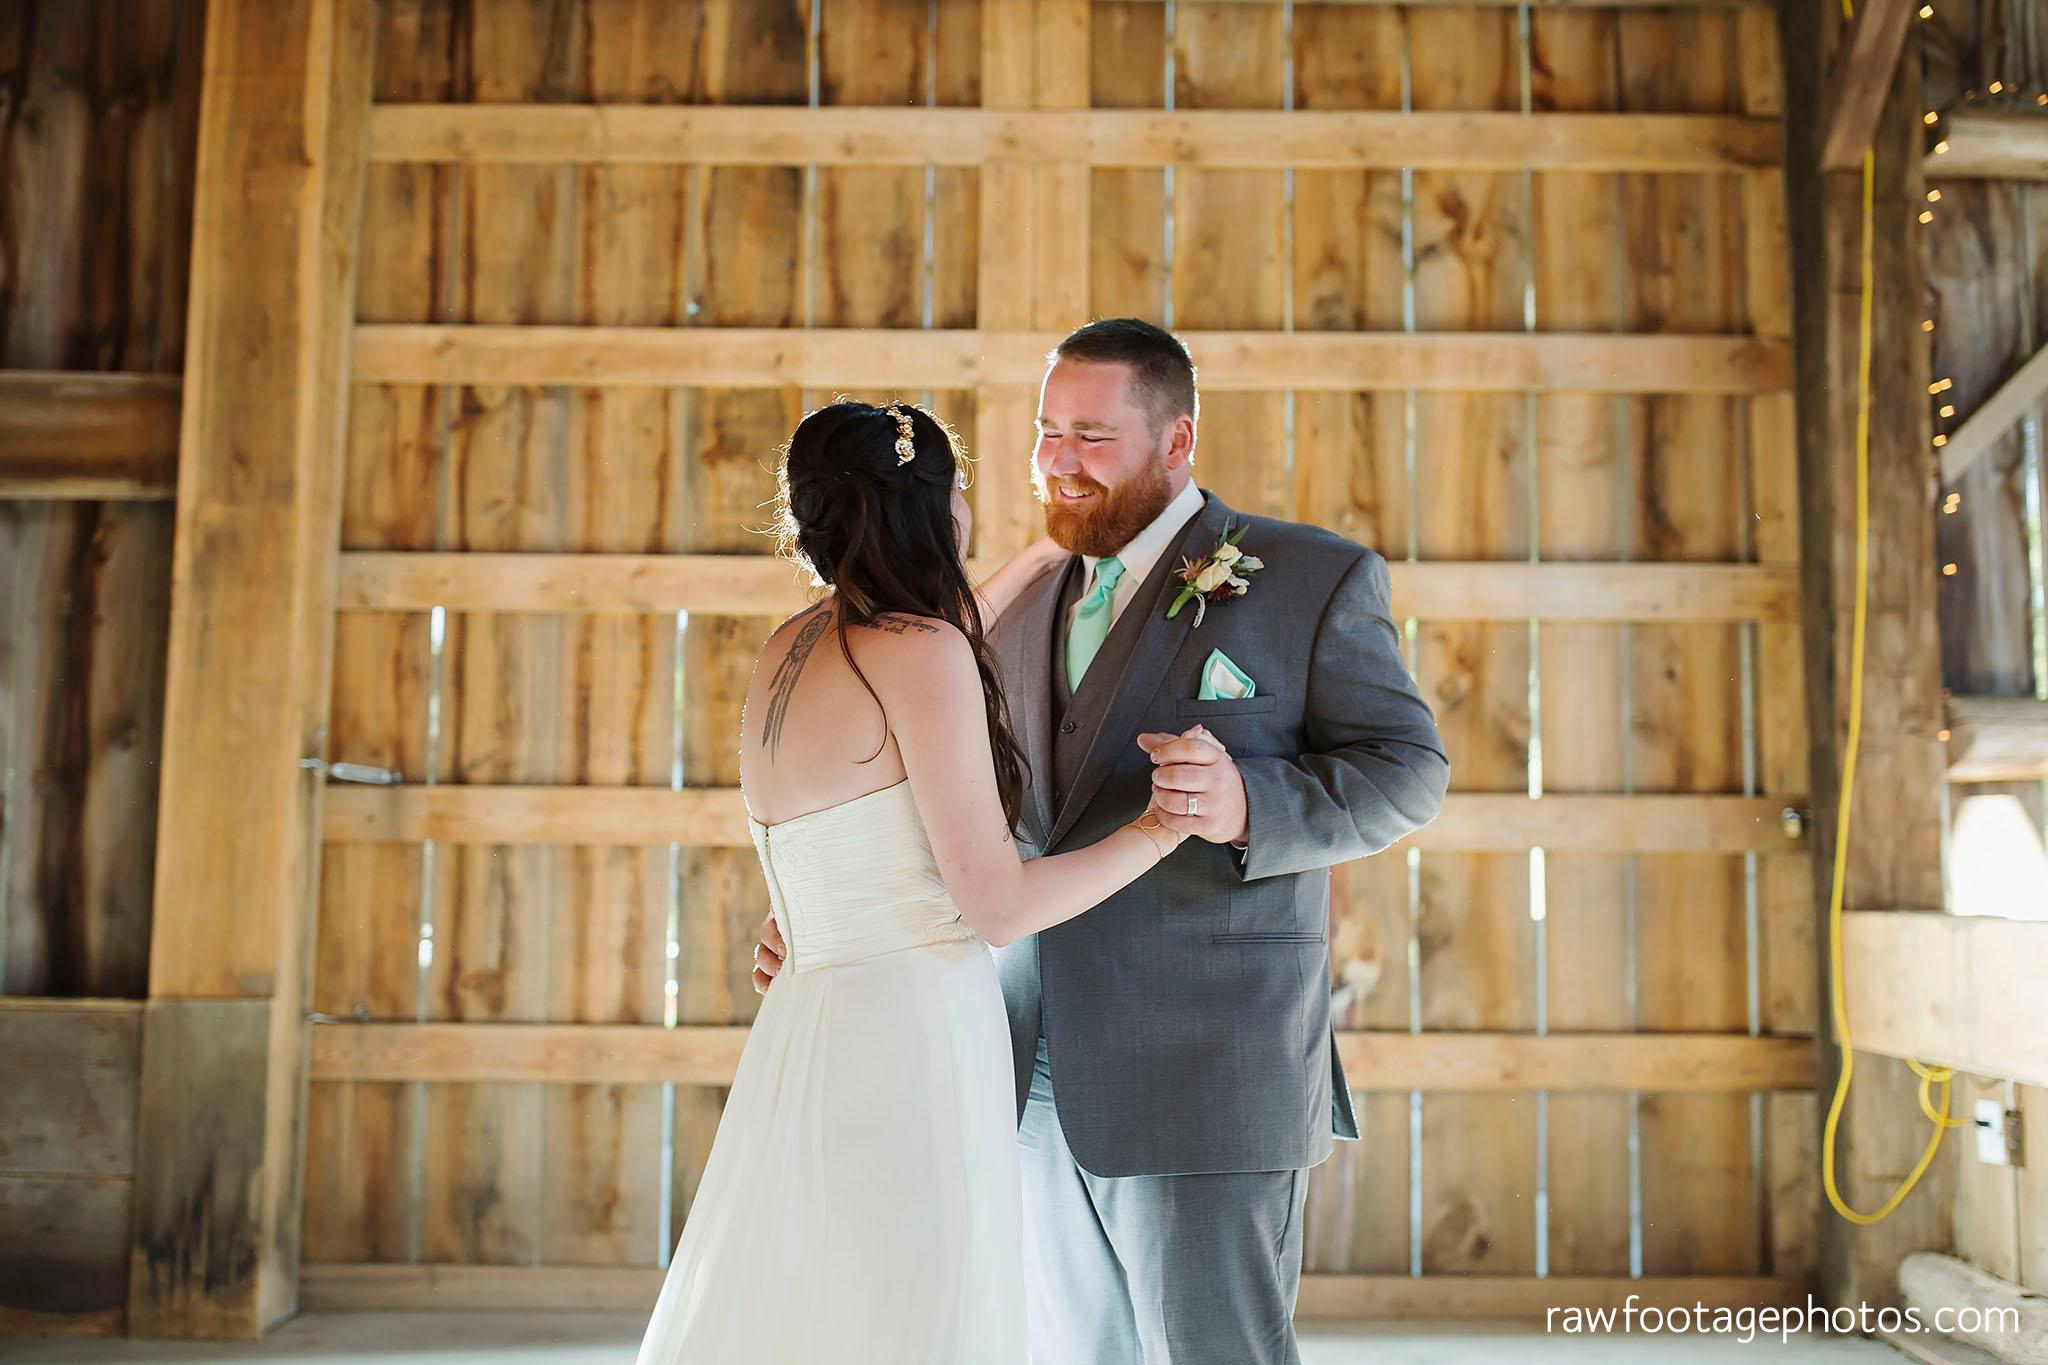 london_ontario_wedding_photographer-century_wedding_barn-raw_footage_photography-diy_wedding088.jpg